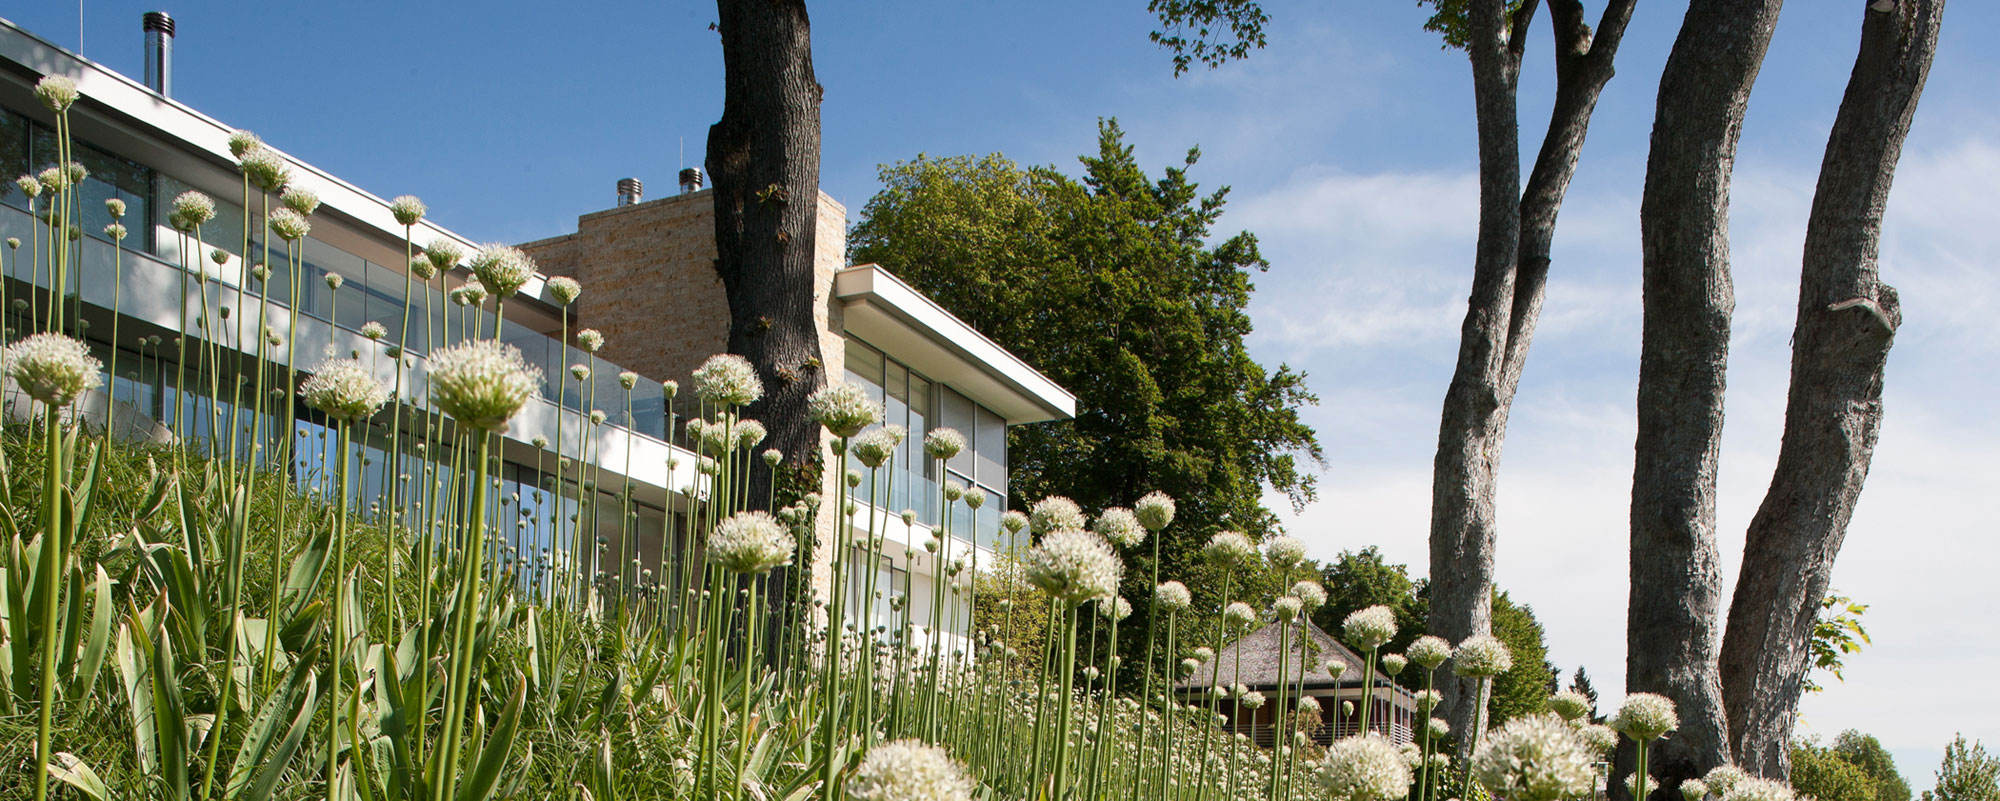 Modern S House near Munich by Stephan Maria Lang-01